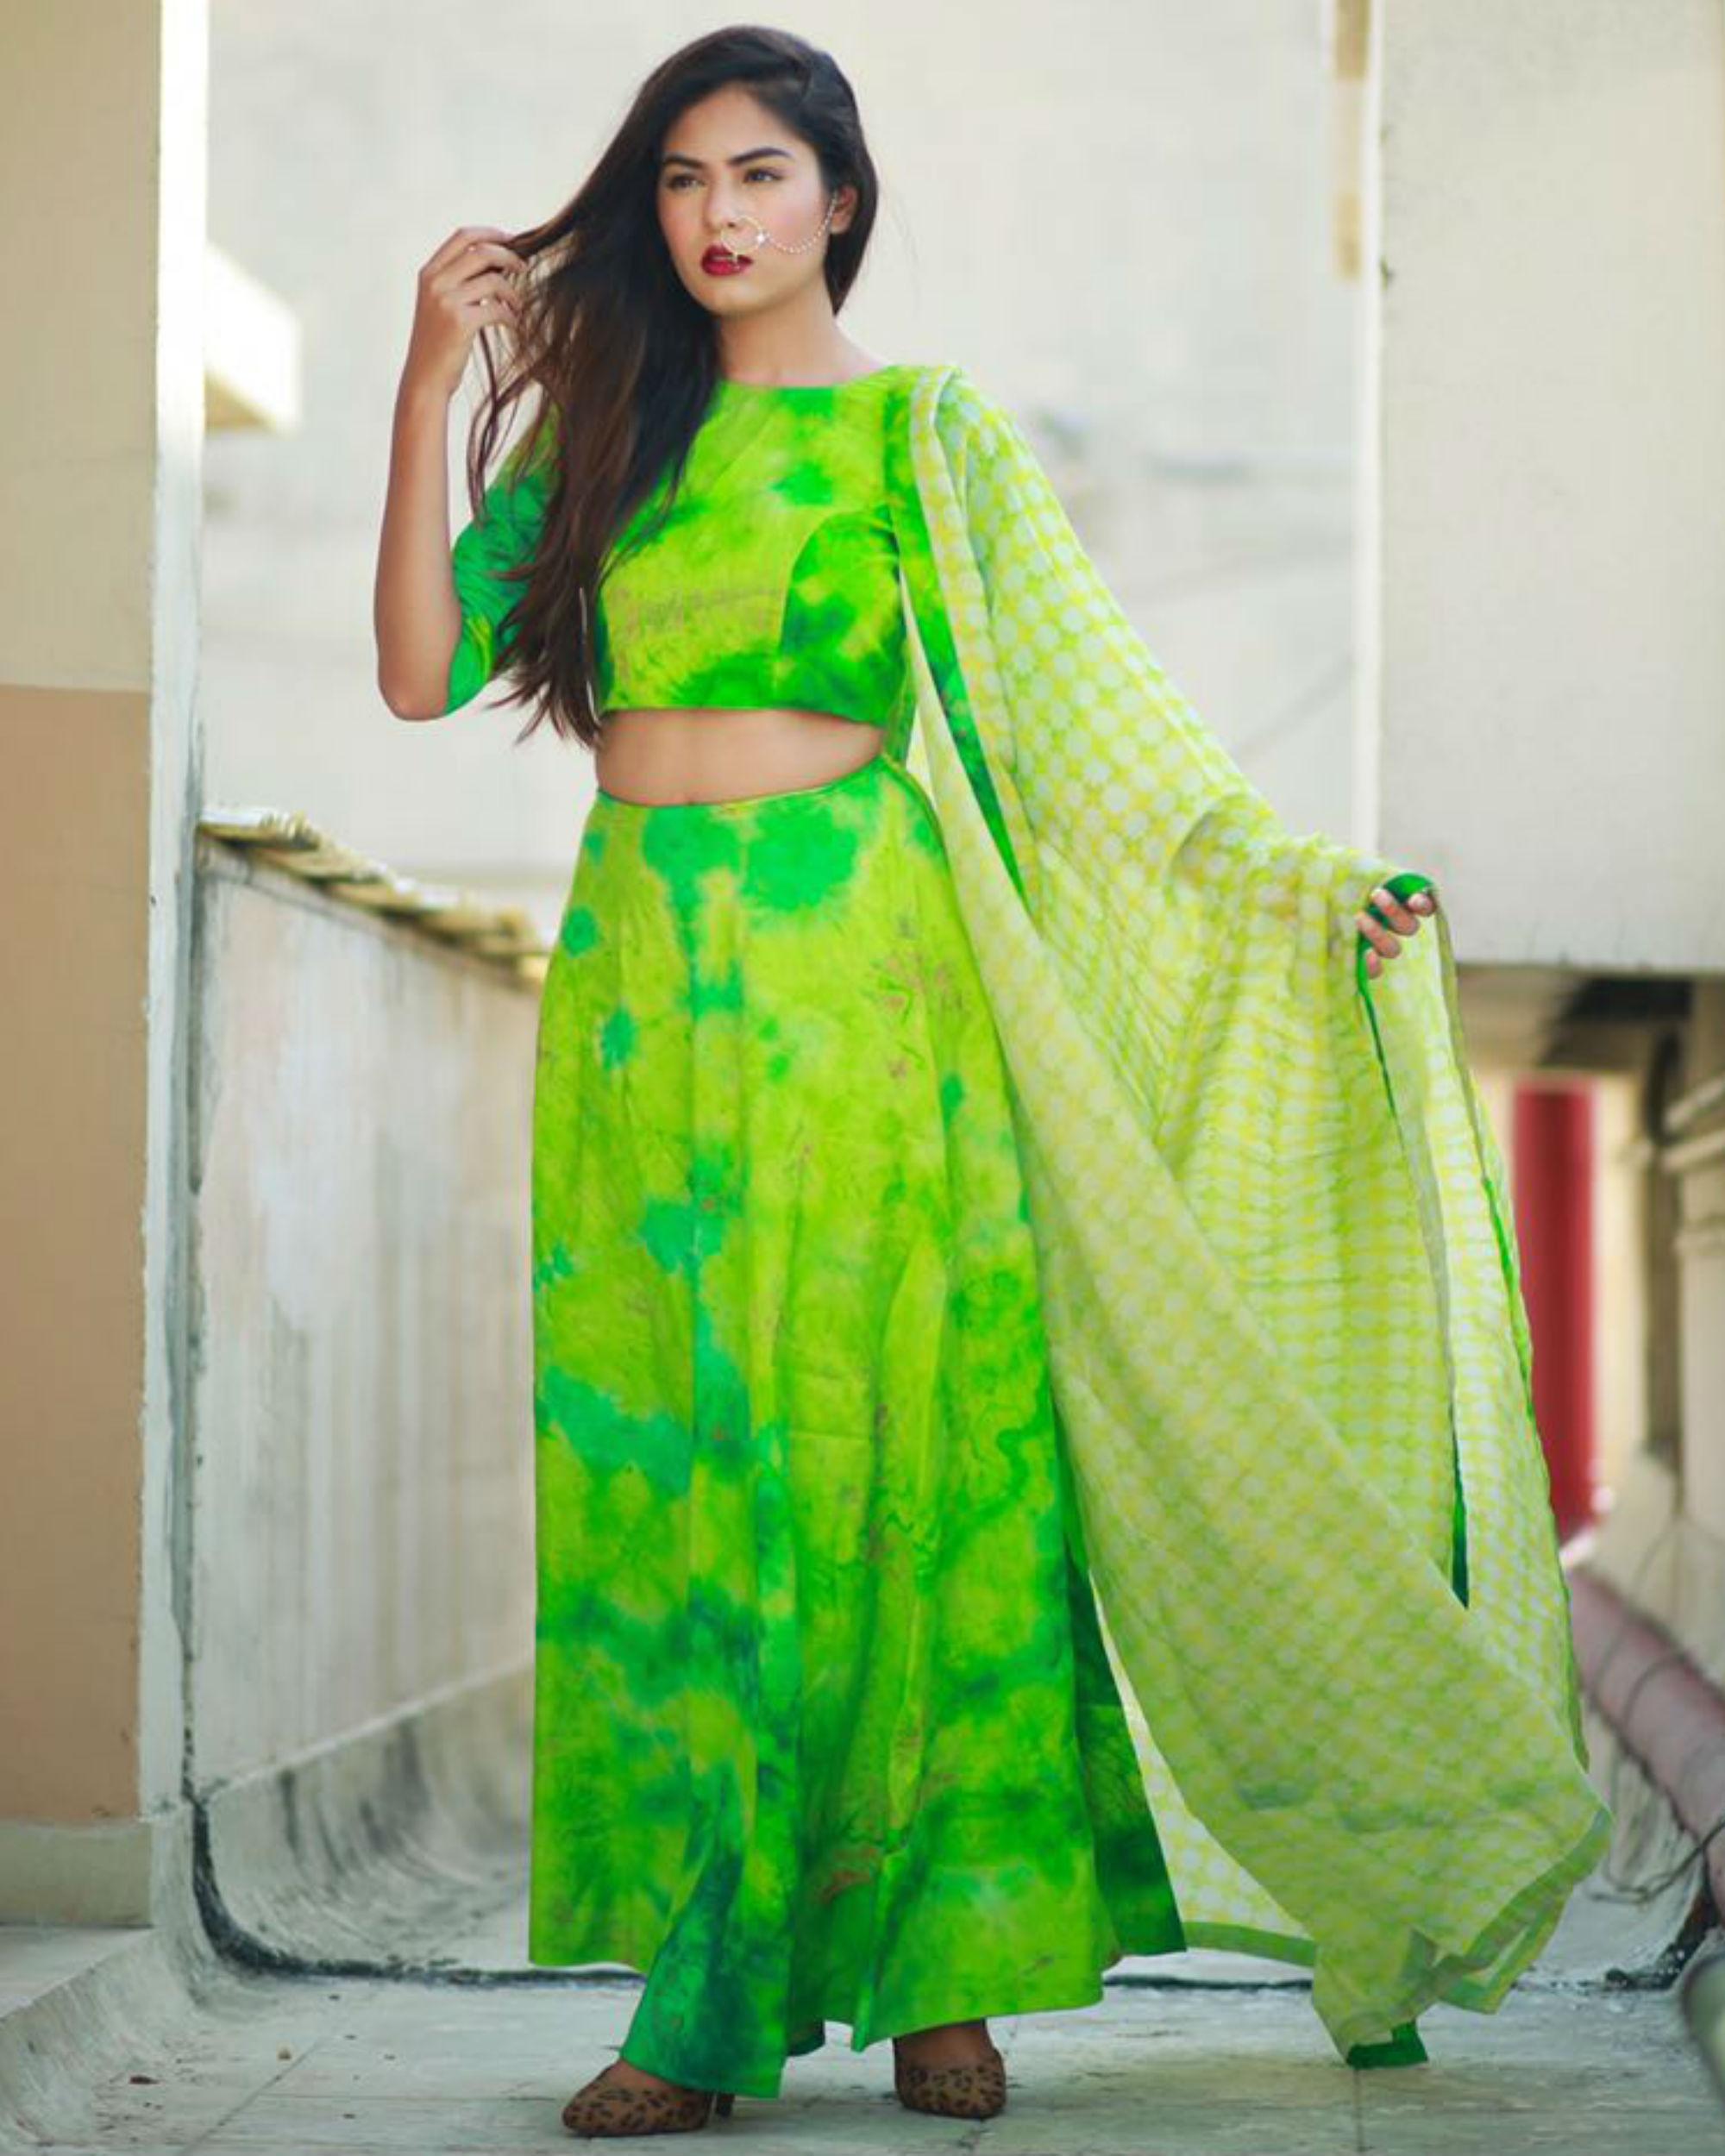 Green ghaghra set with dupatta